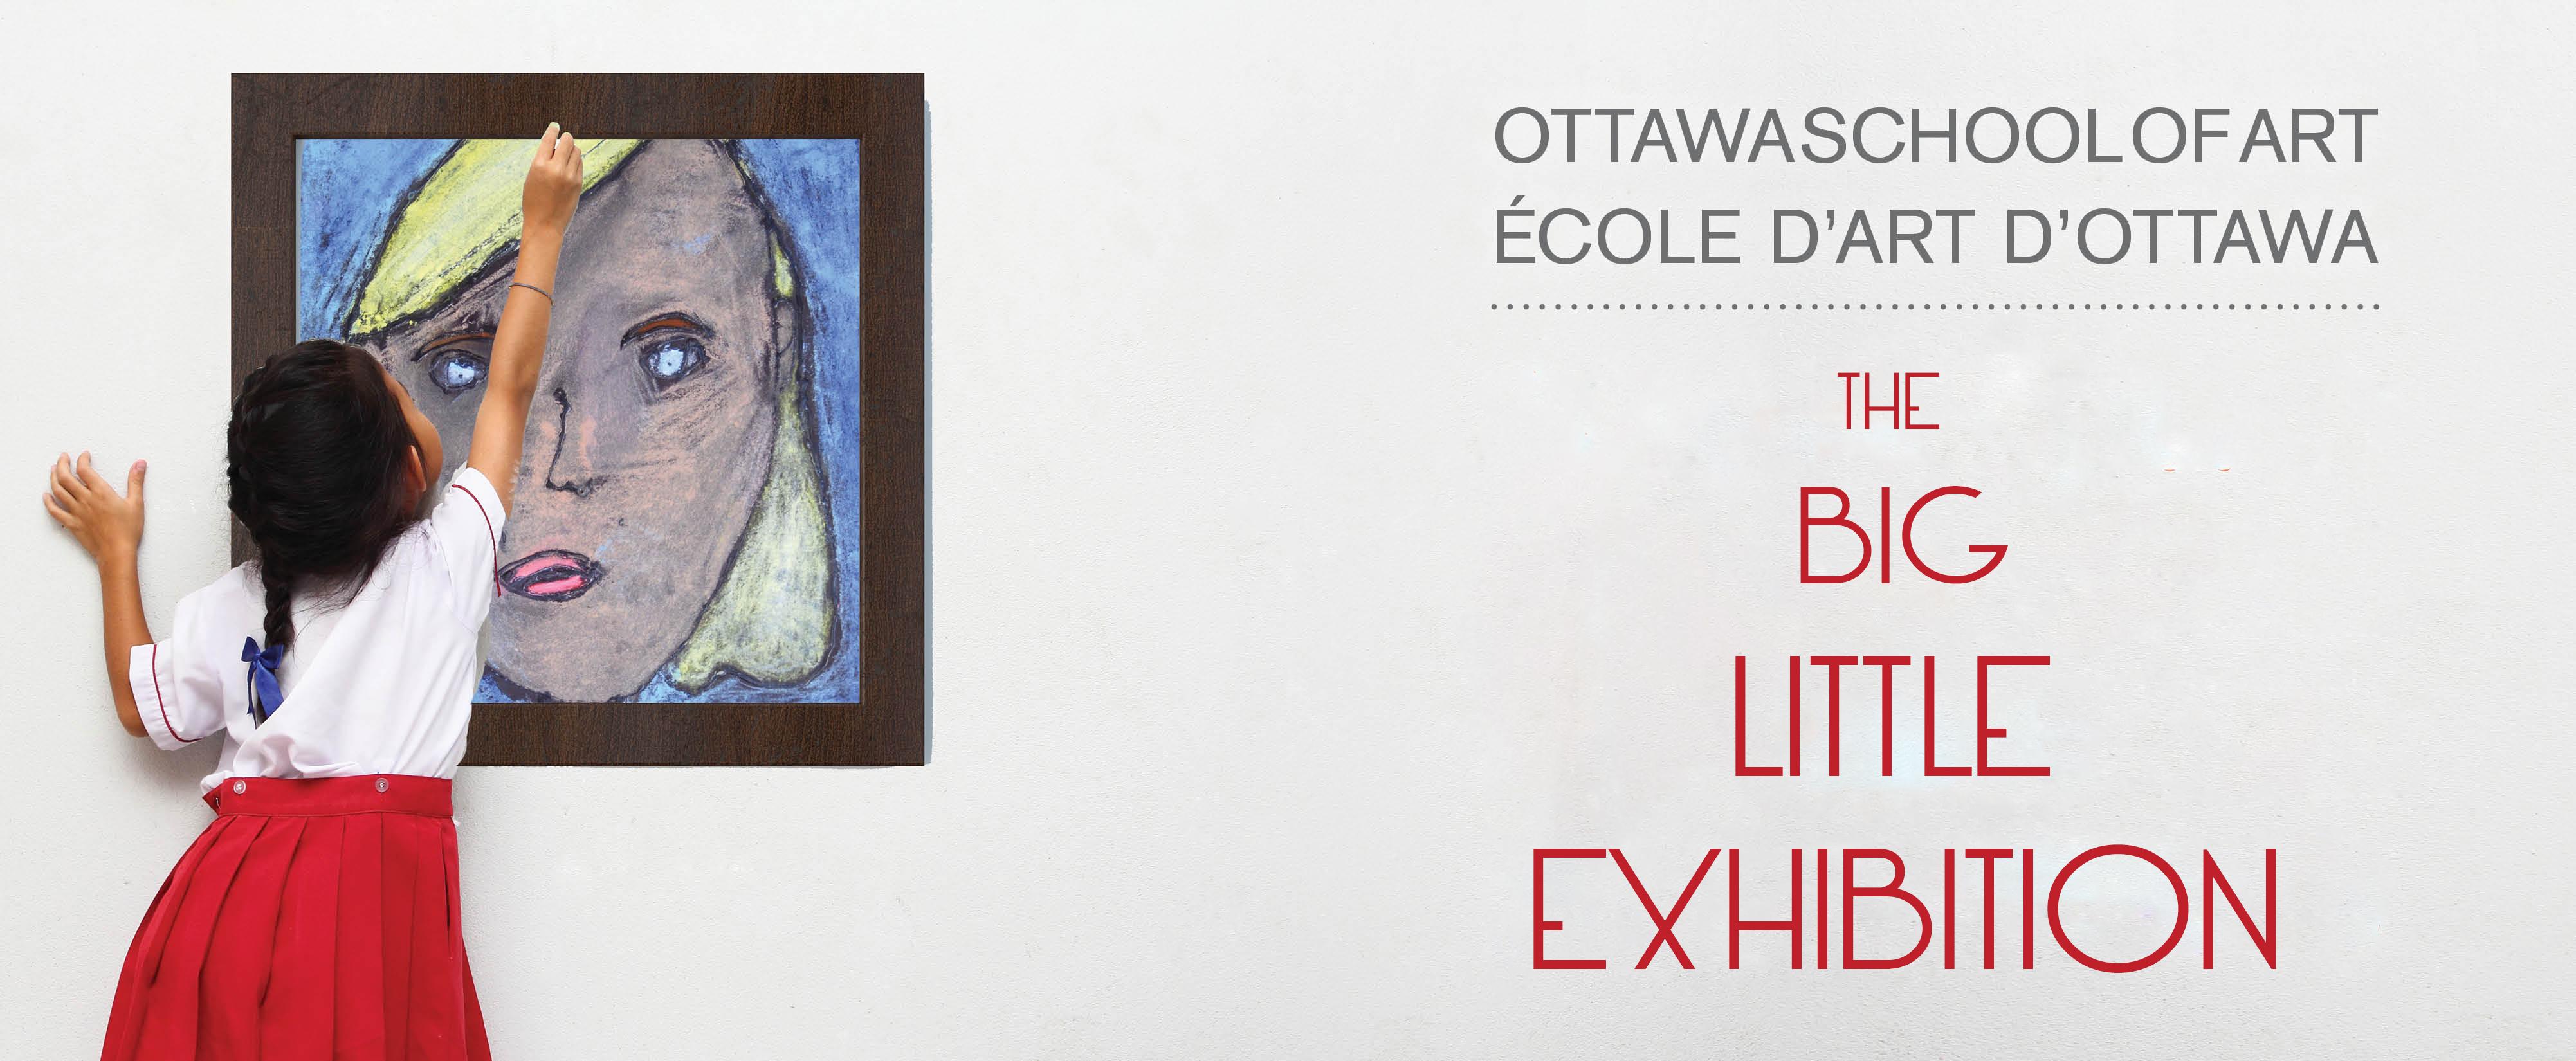 Arts Camps Ontario Big Little Exhibition Banner